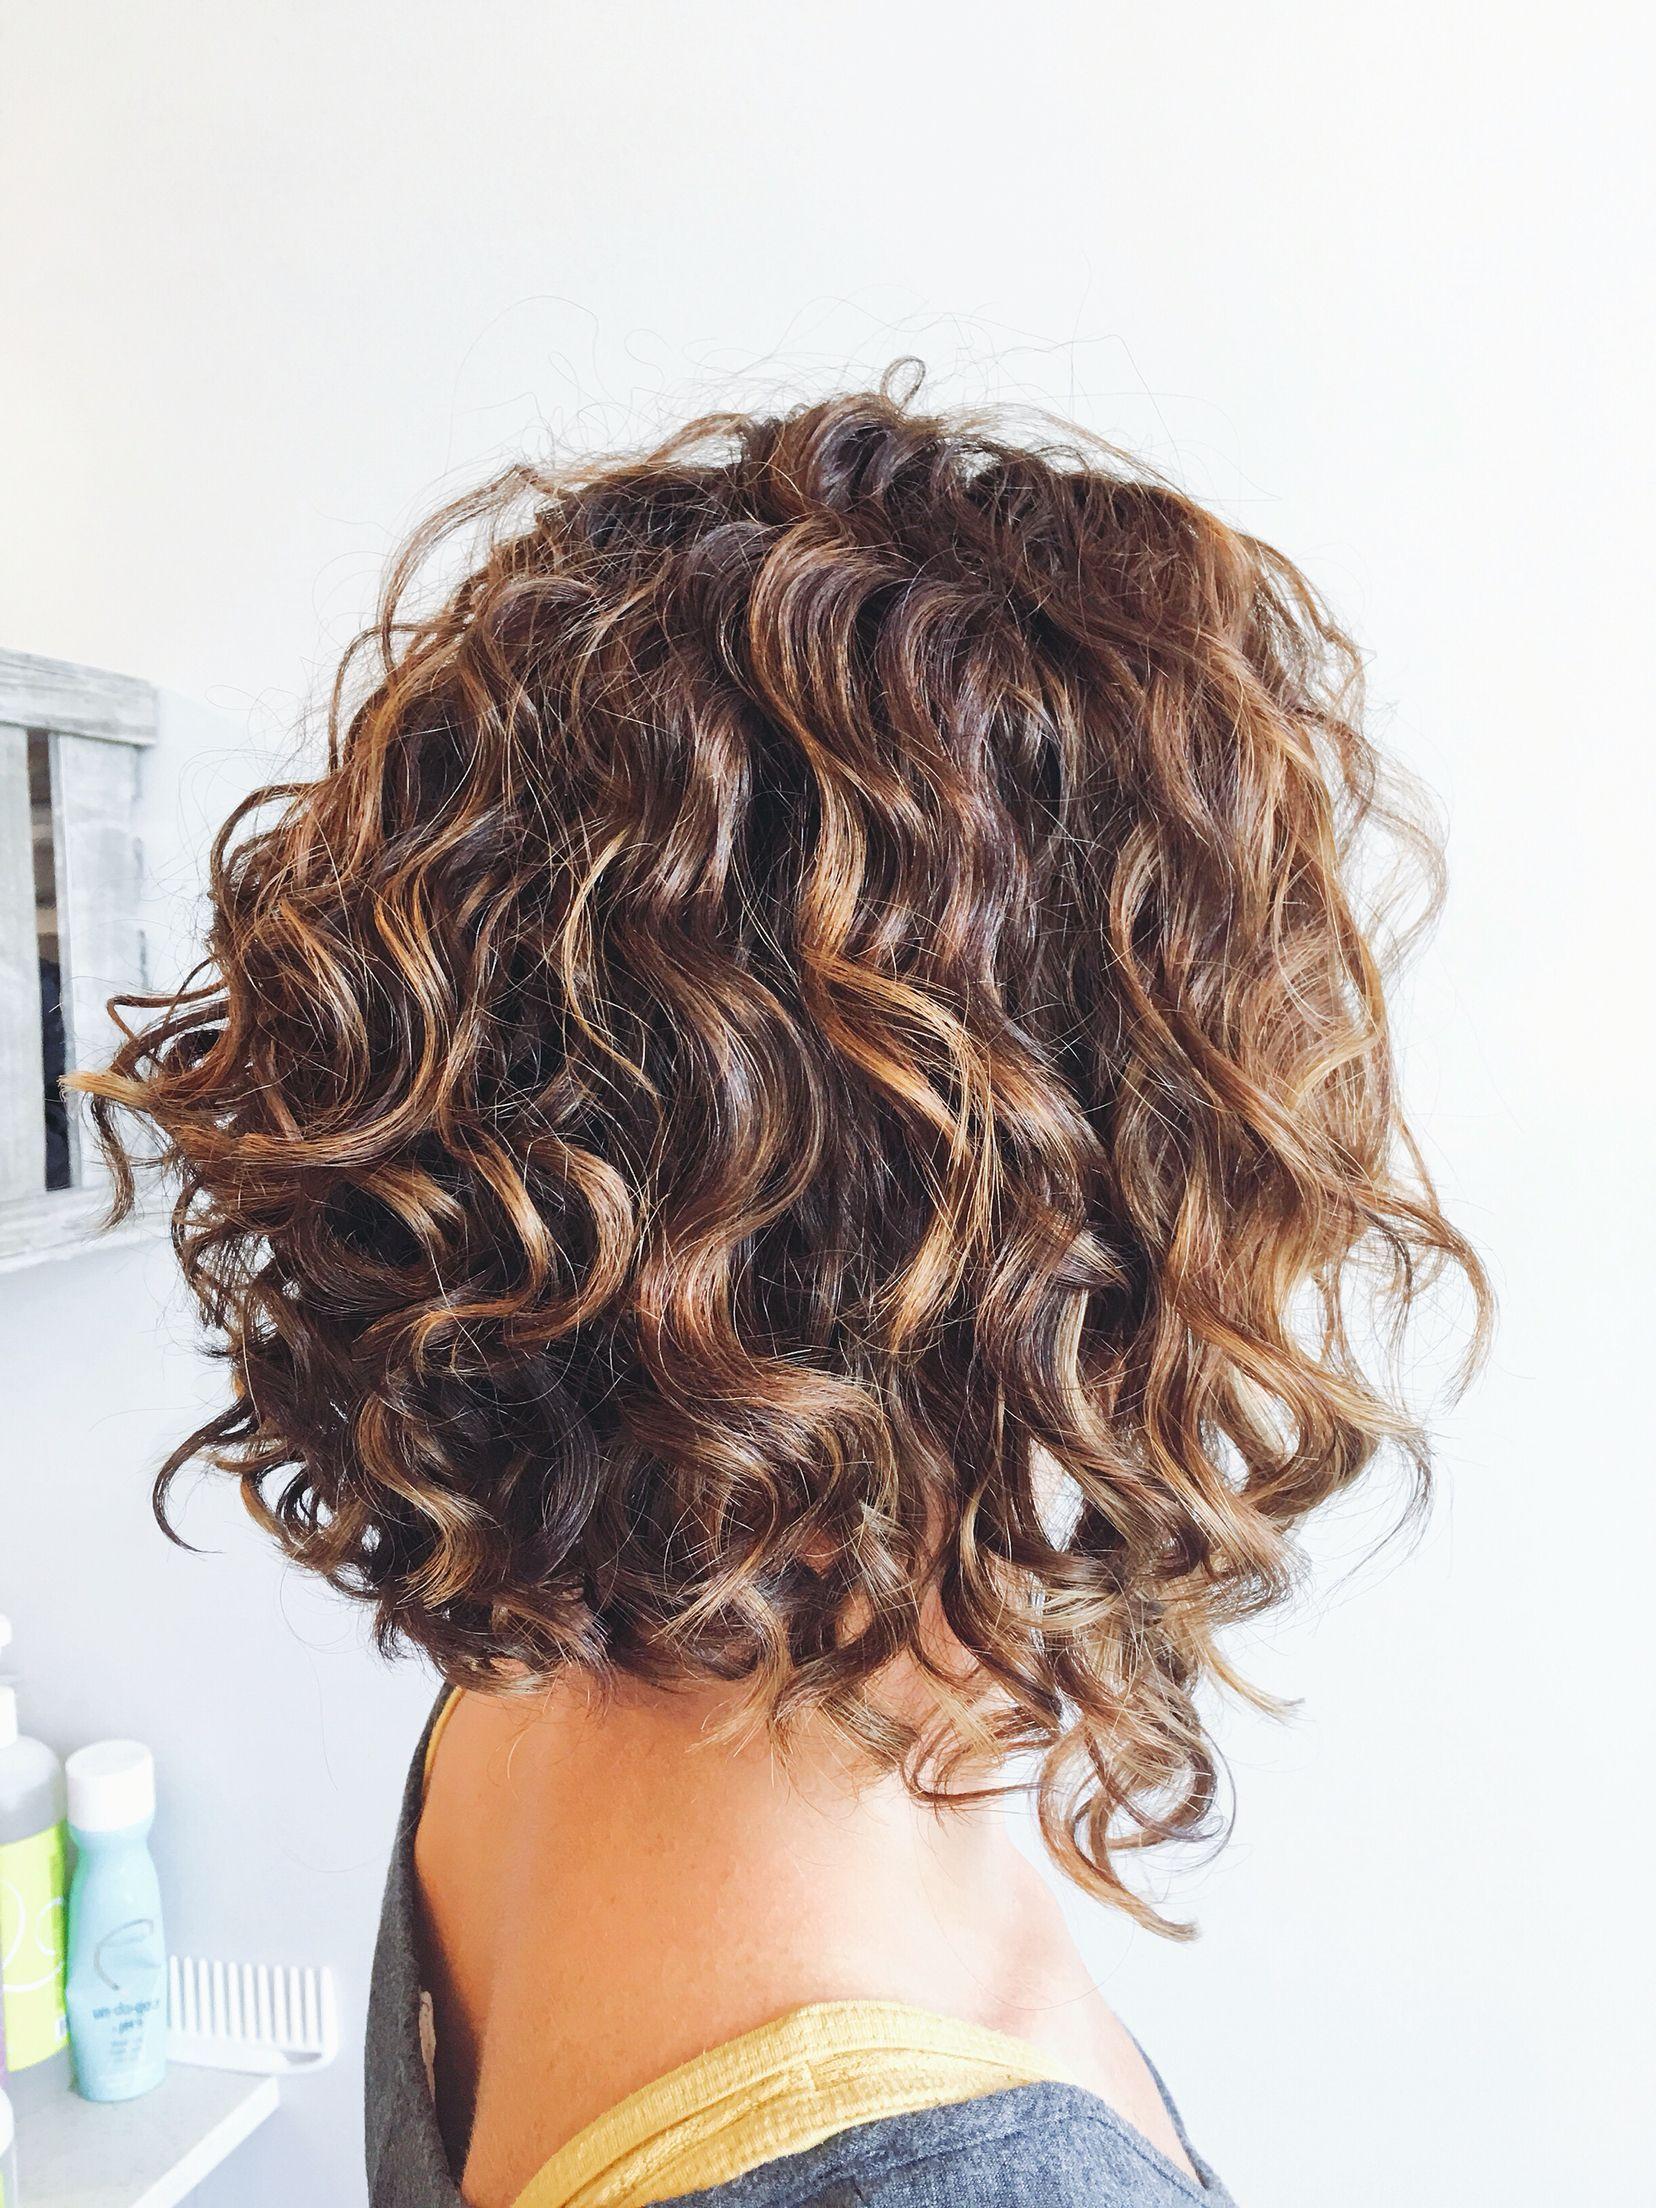 Neue Lockige Frisuren Kurzes Haar Neu Frisuren 2018 Gestufte Haare Naturlocken Frisuren Lockige Kurze Bobs